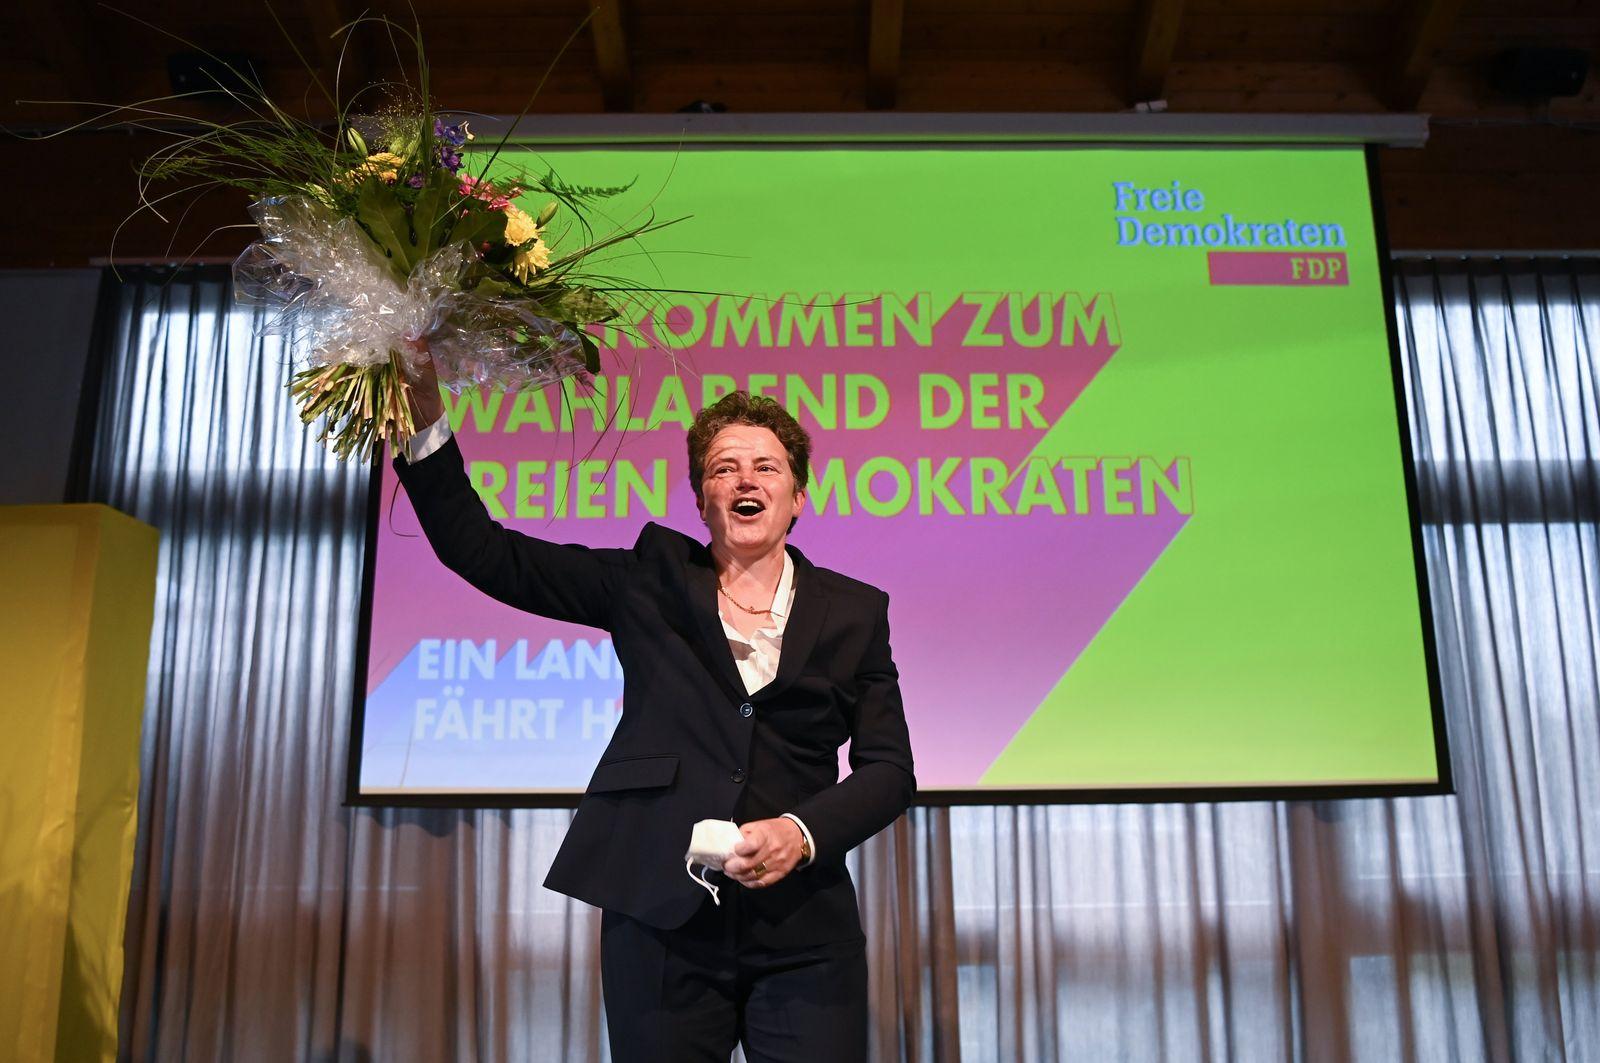 Landtagswahl Sachsen-Anhalt - FDP